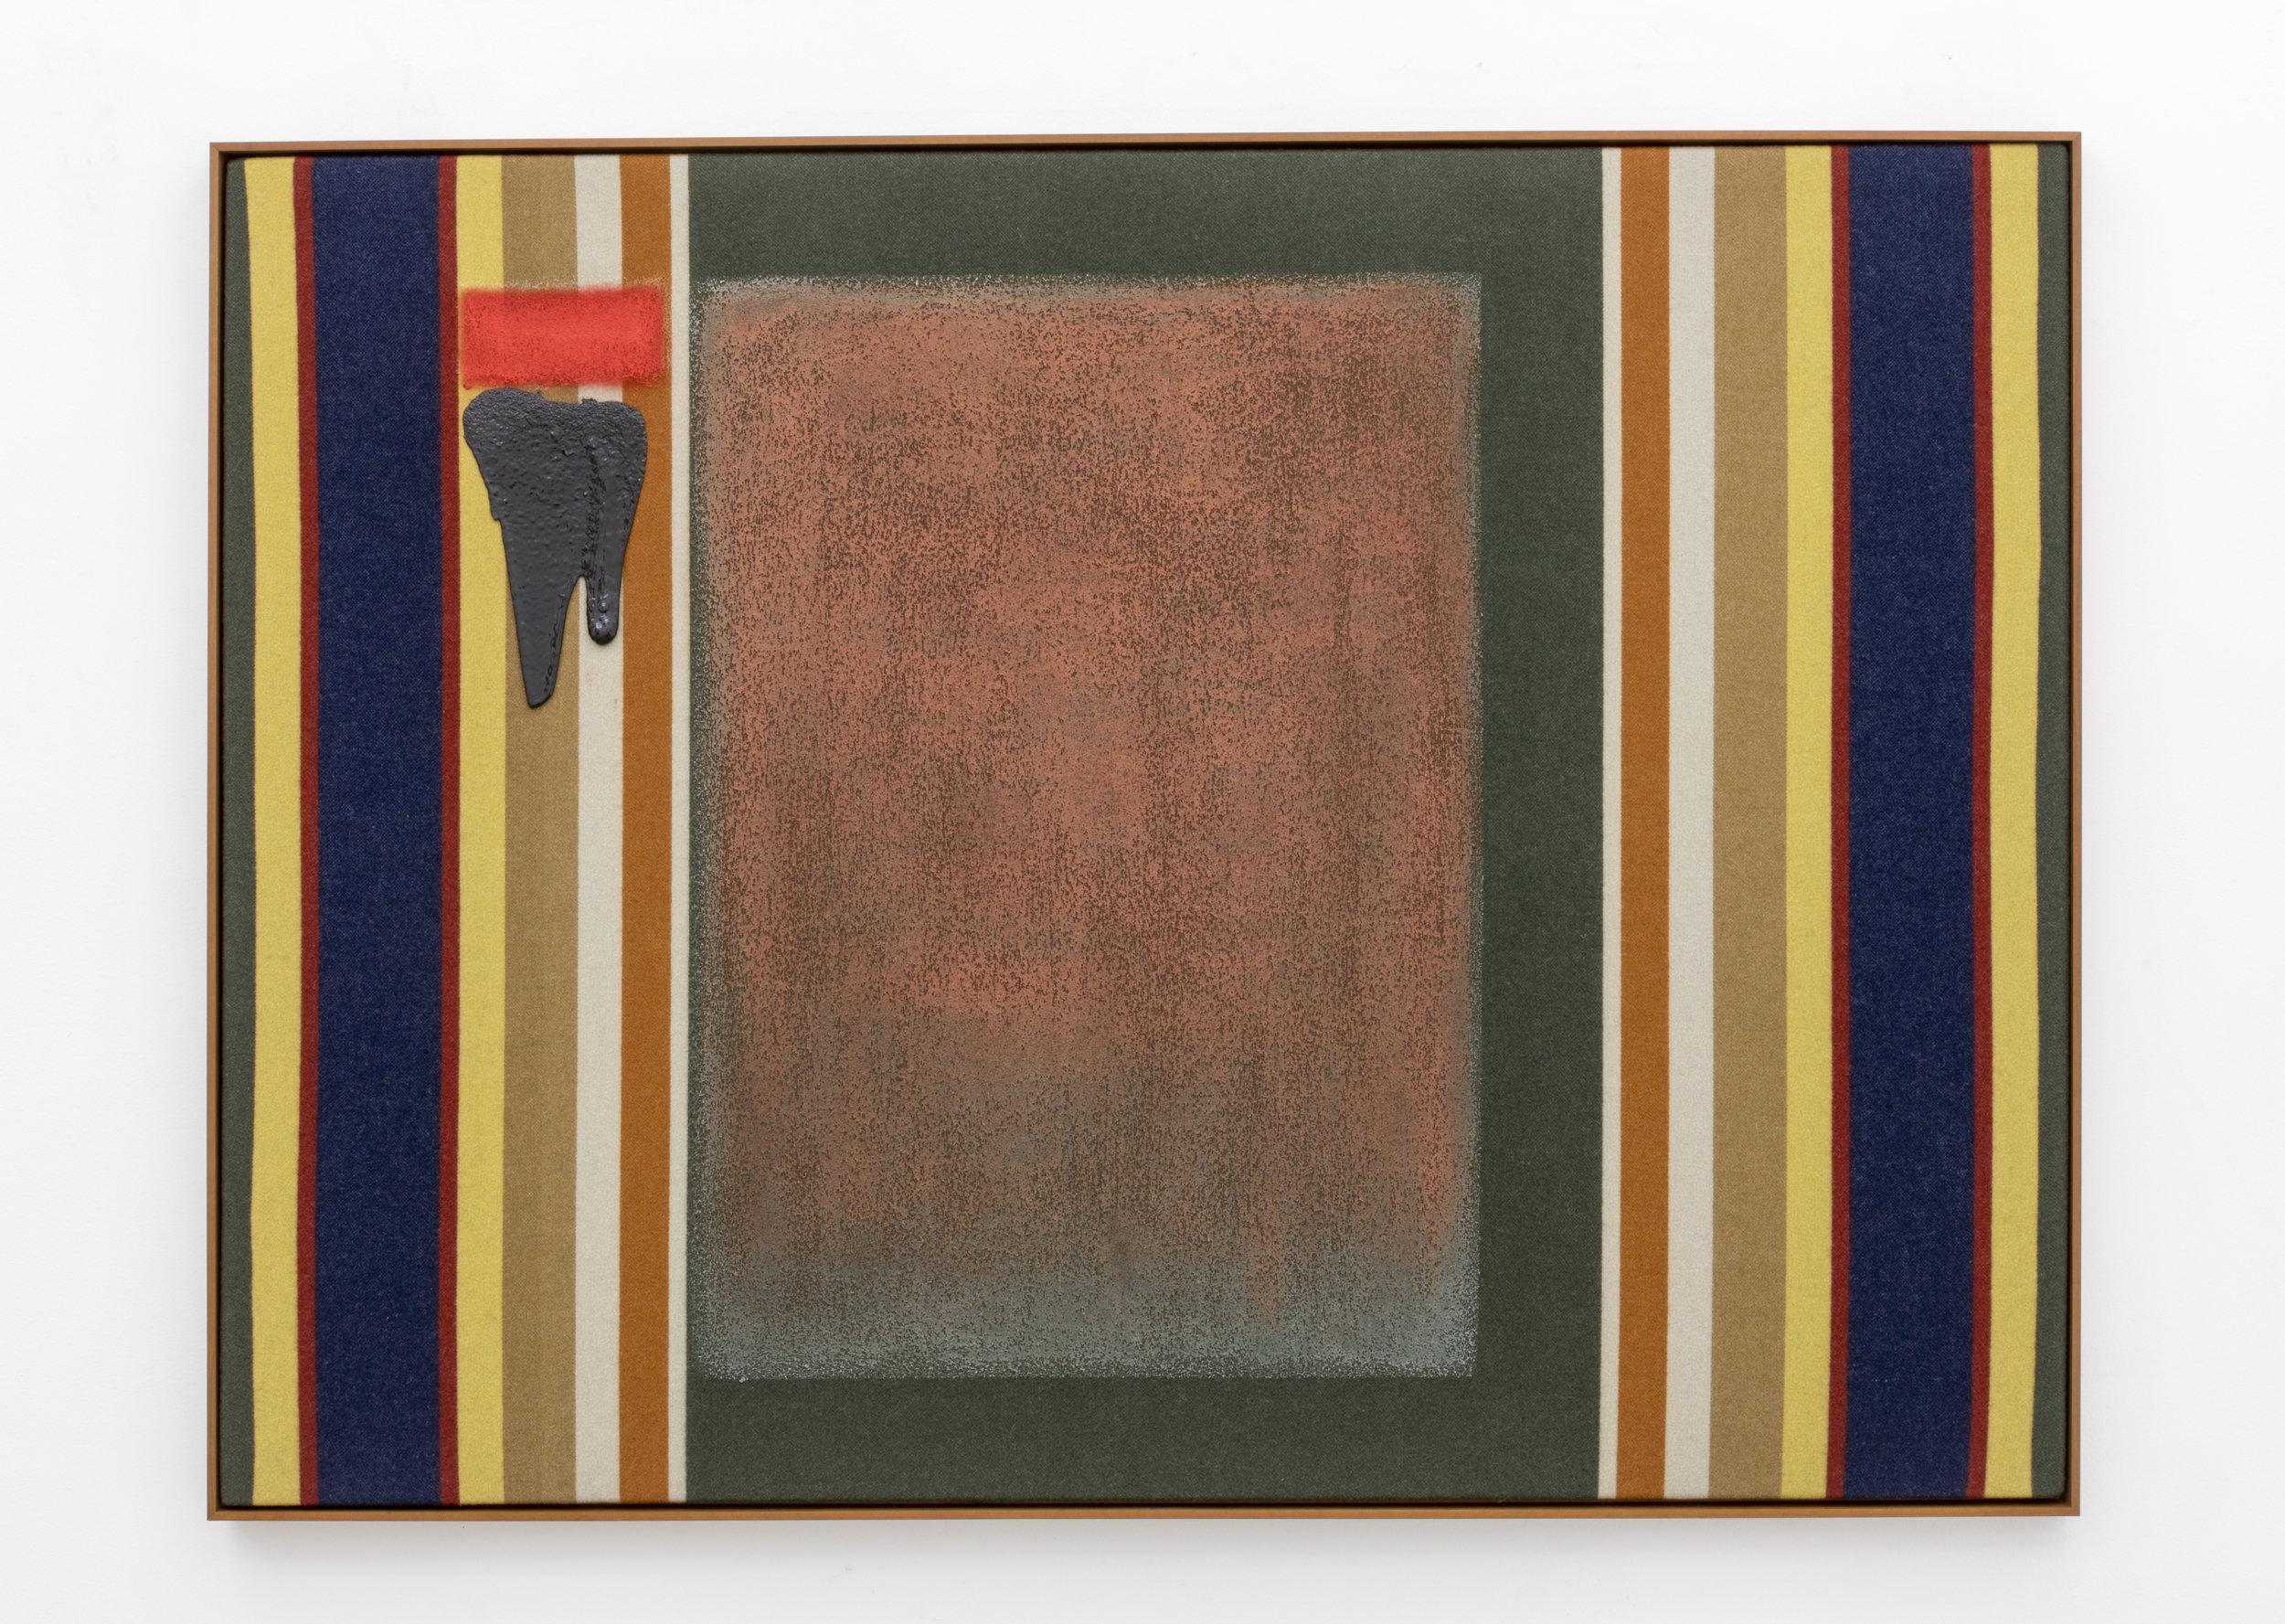 Untitled (Badlands),  2018  Pendleton Wool, Oil Stick  55 x 72 x 2 in  Photo: Tara J Graves